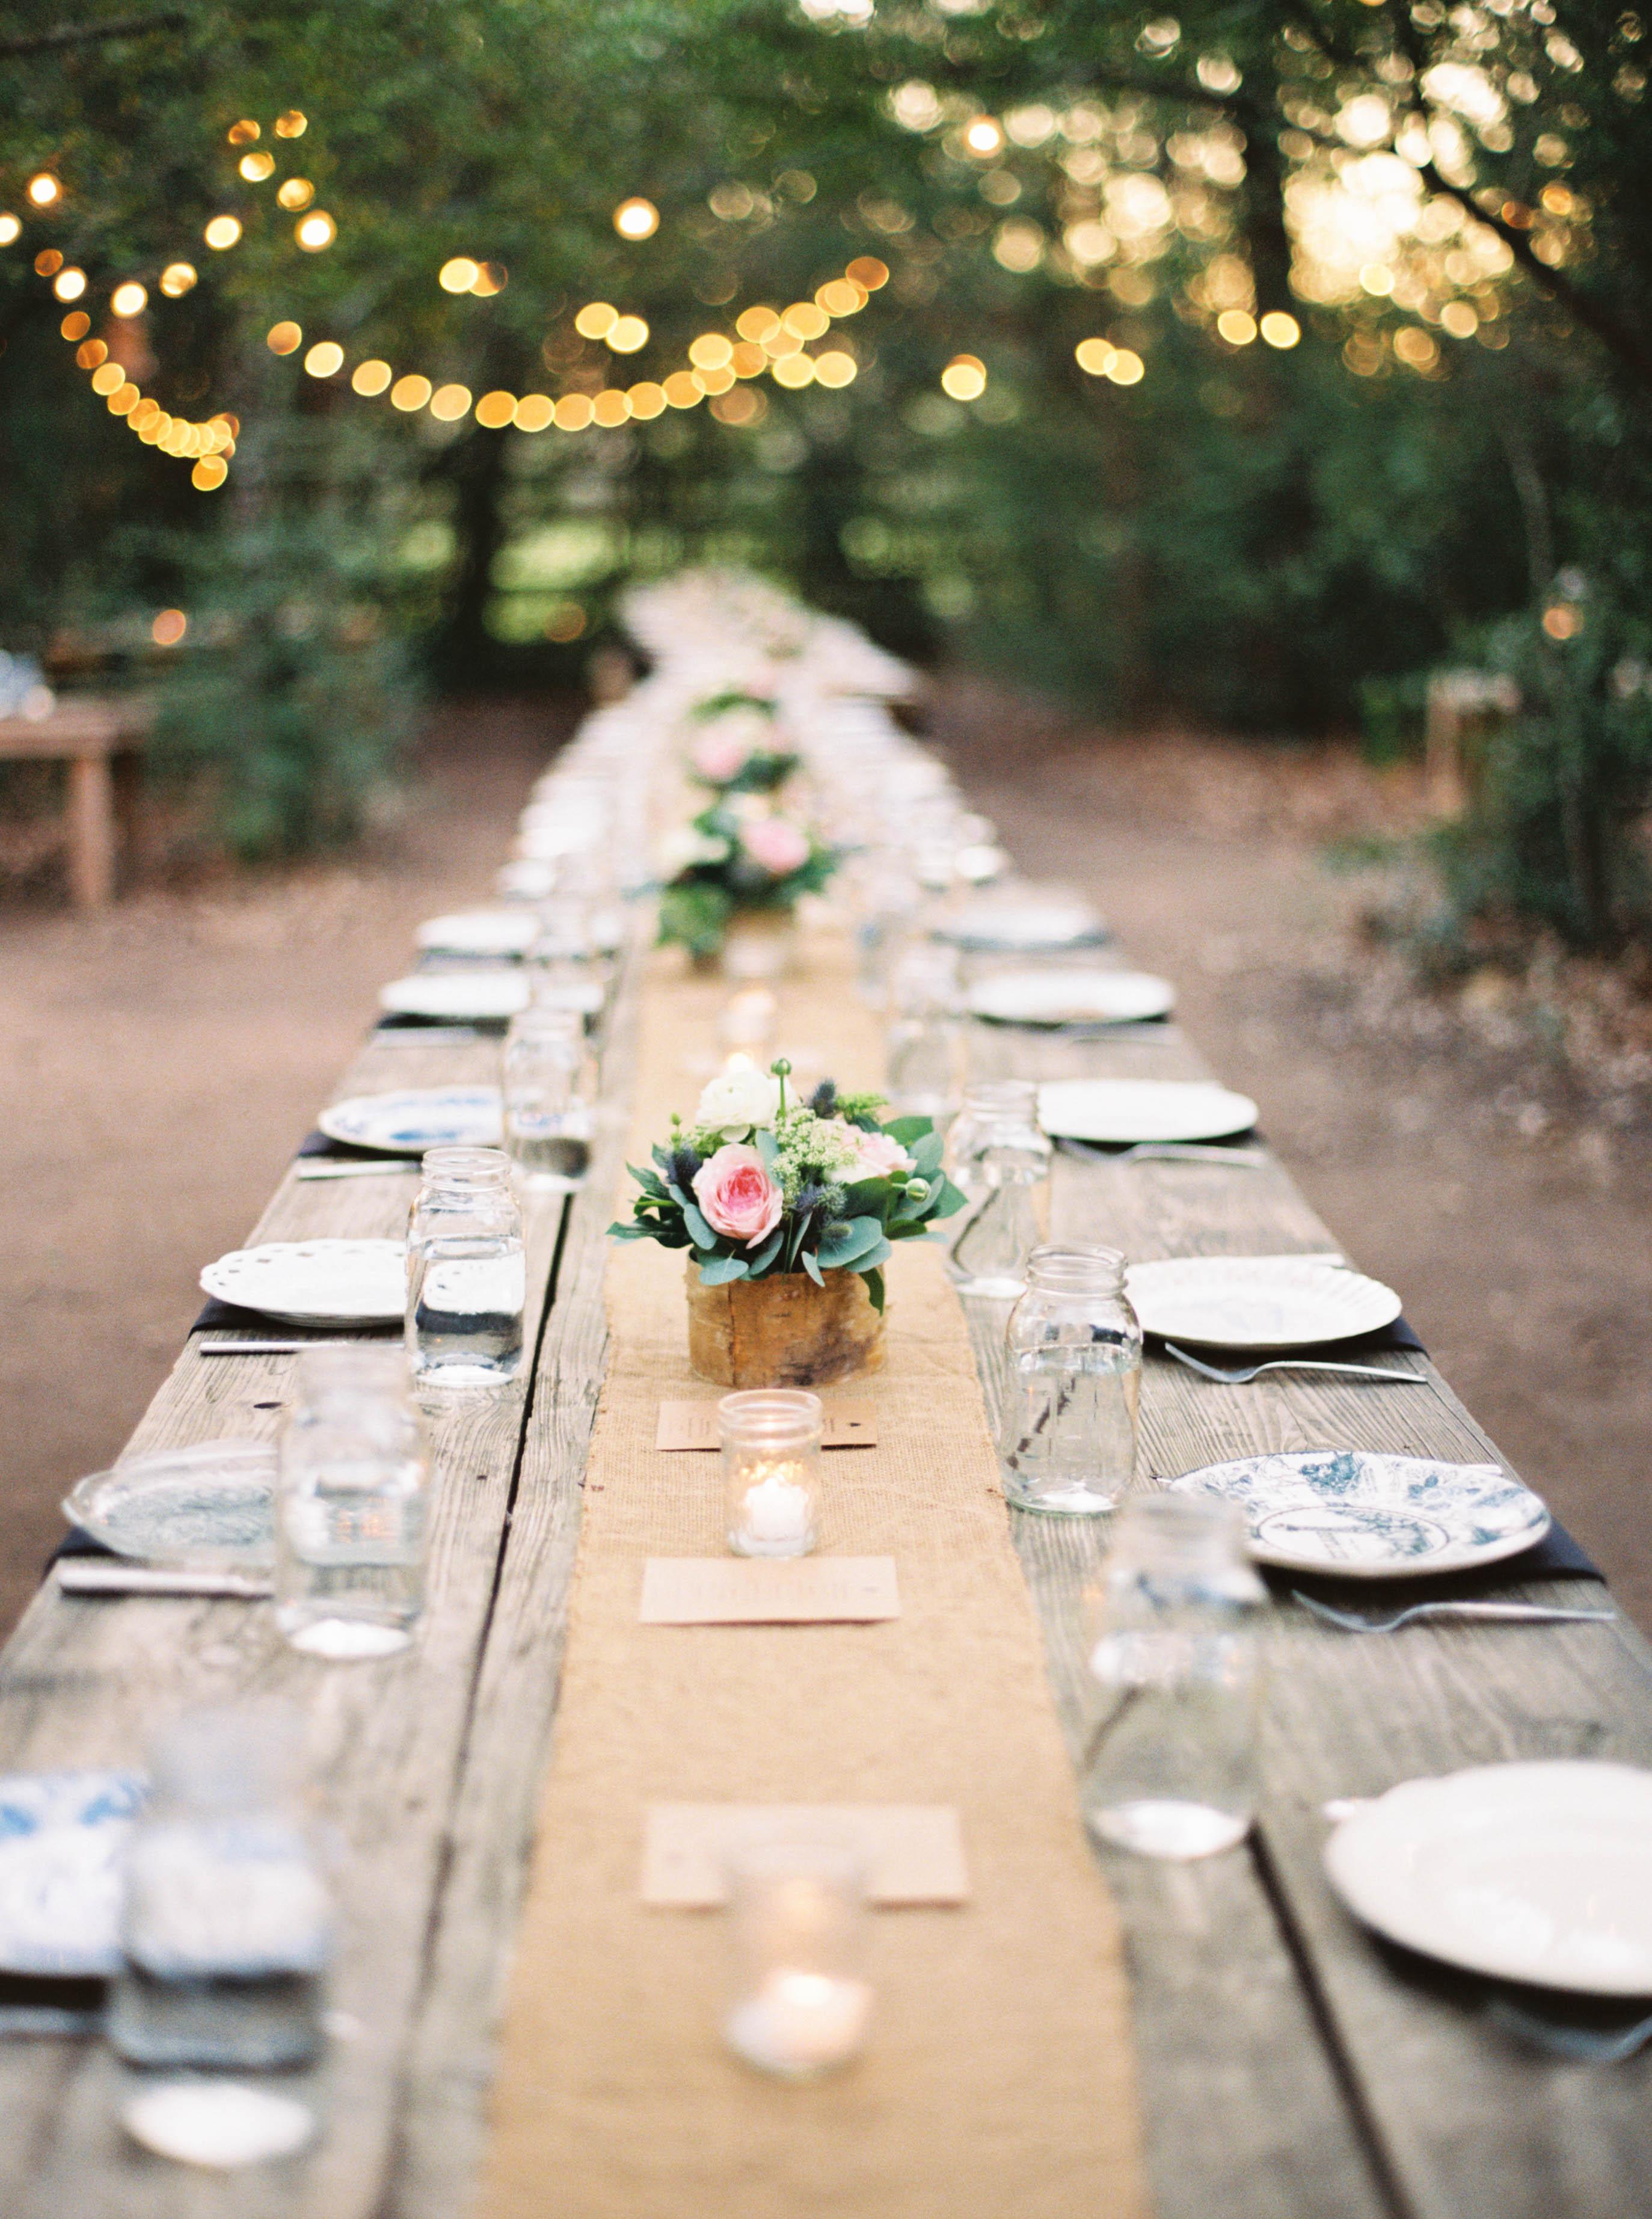 mason jar drinks table setting outdoors